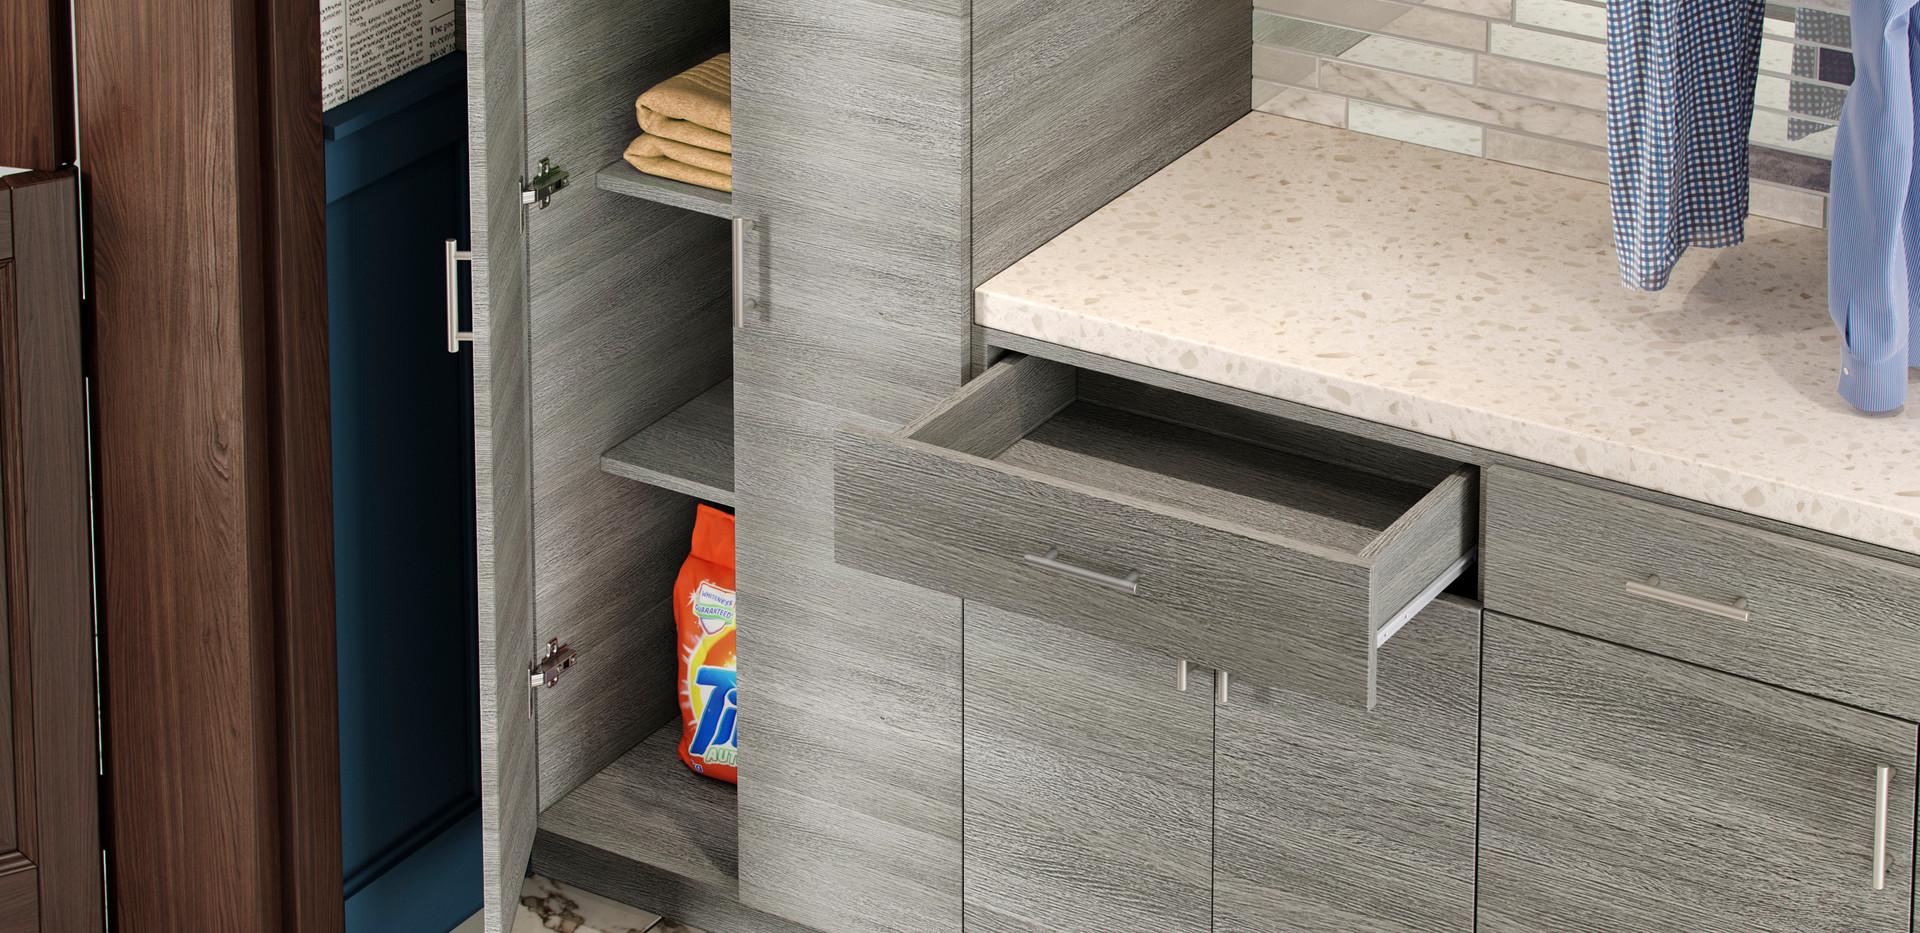 MGW Laundry Room Close-Up (Madrid Interi